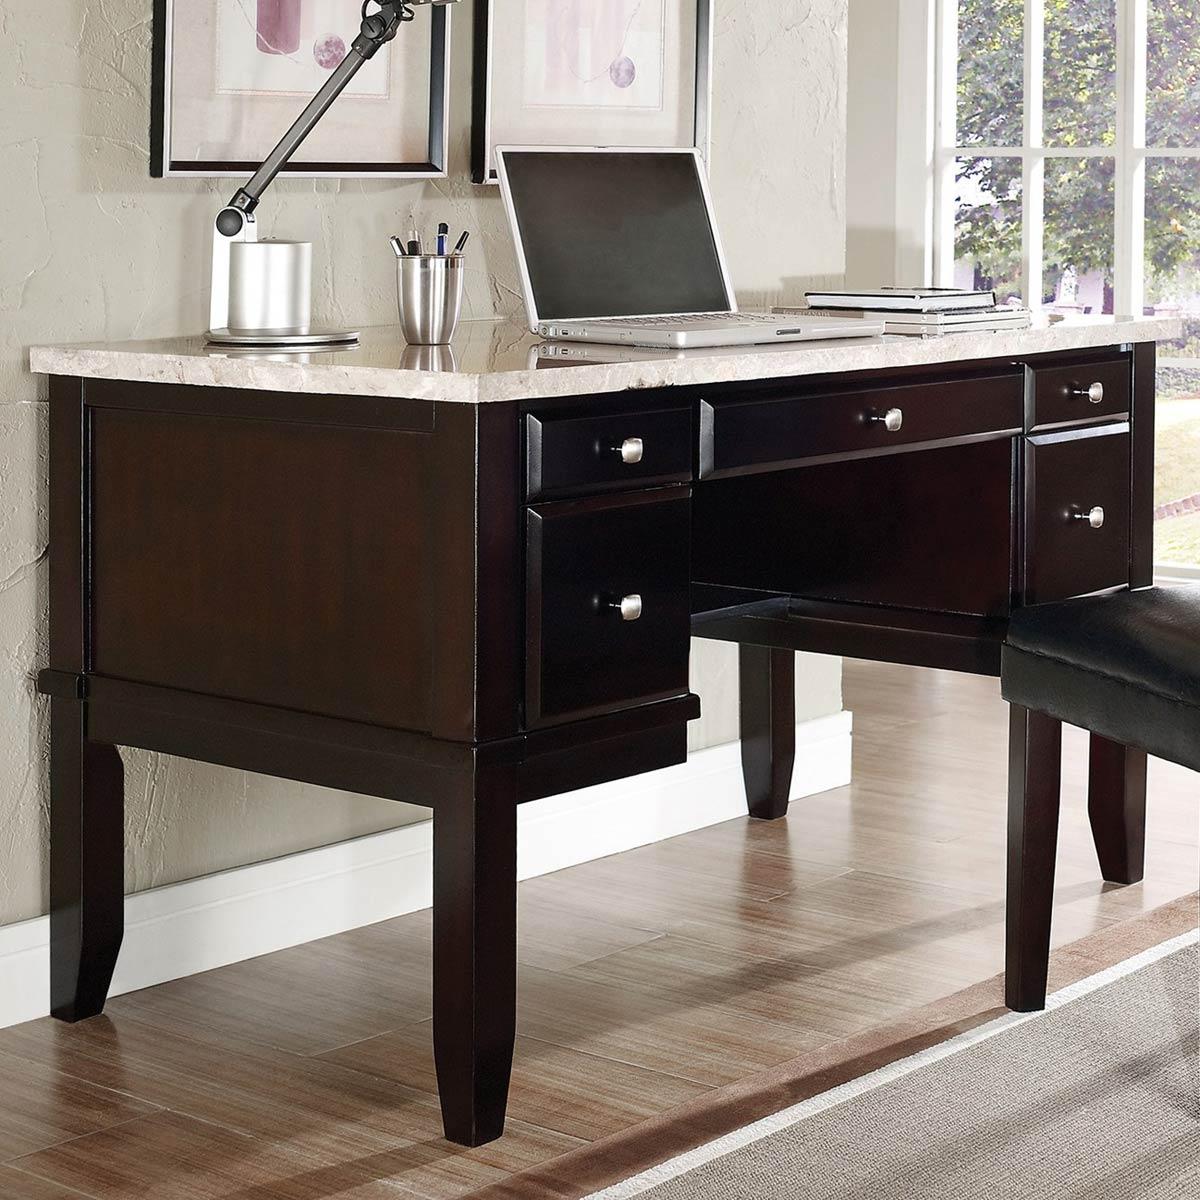 Monarch Home Office Desk   Cream Top, Espresso Wood Base   SSC MC150D ...